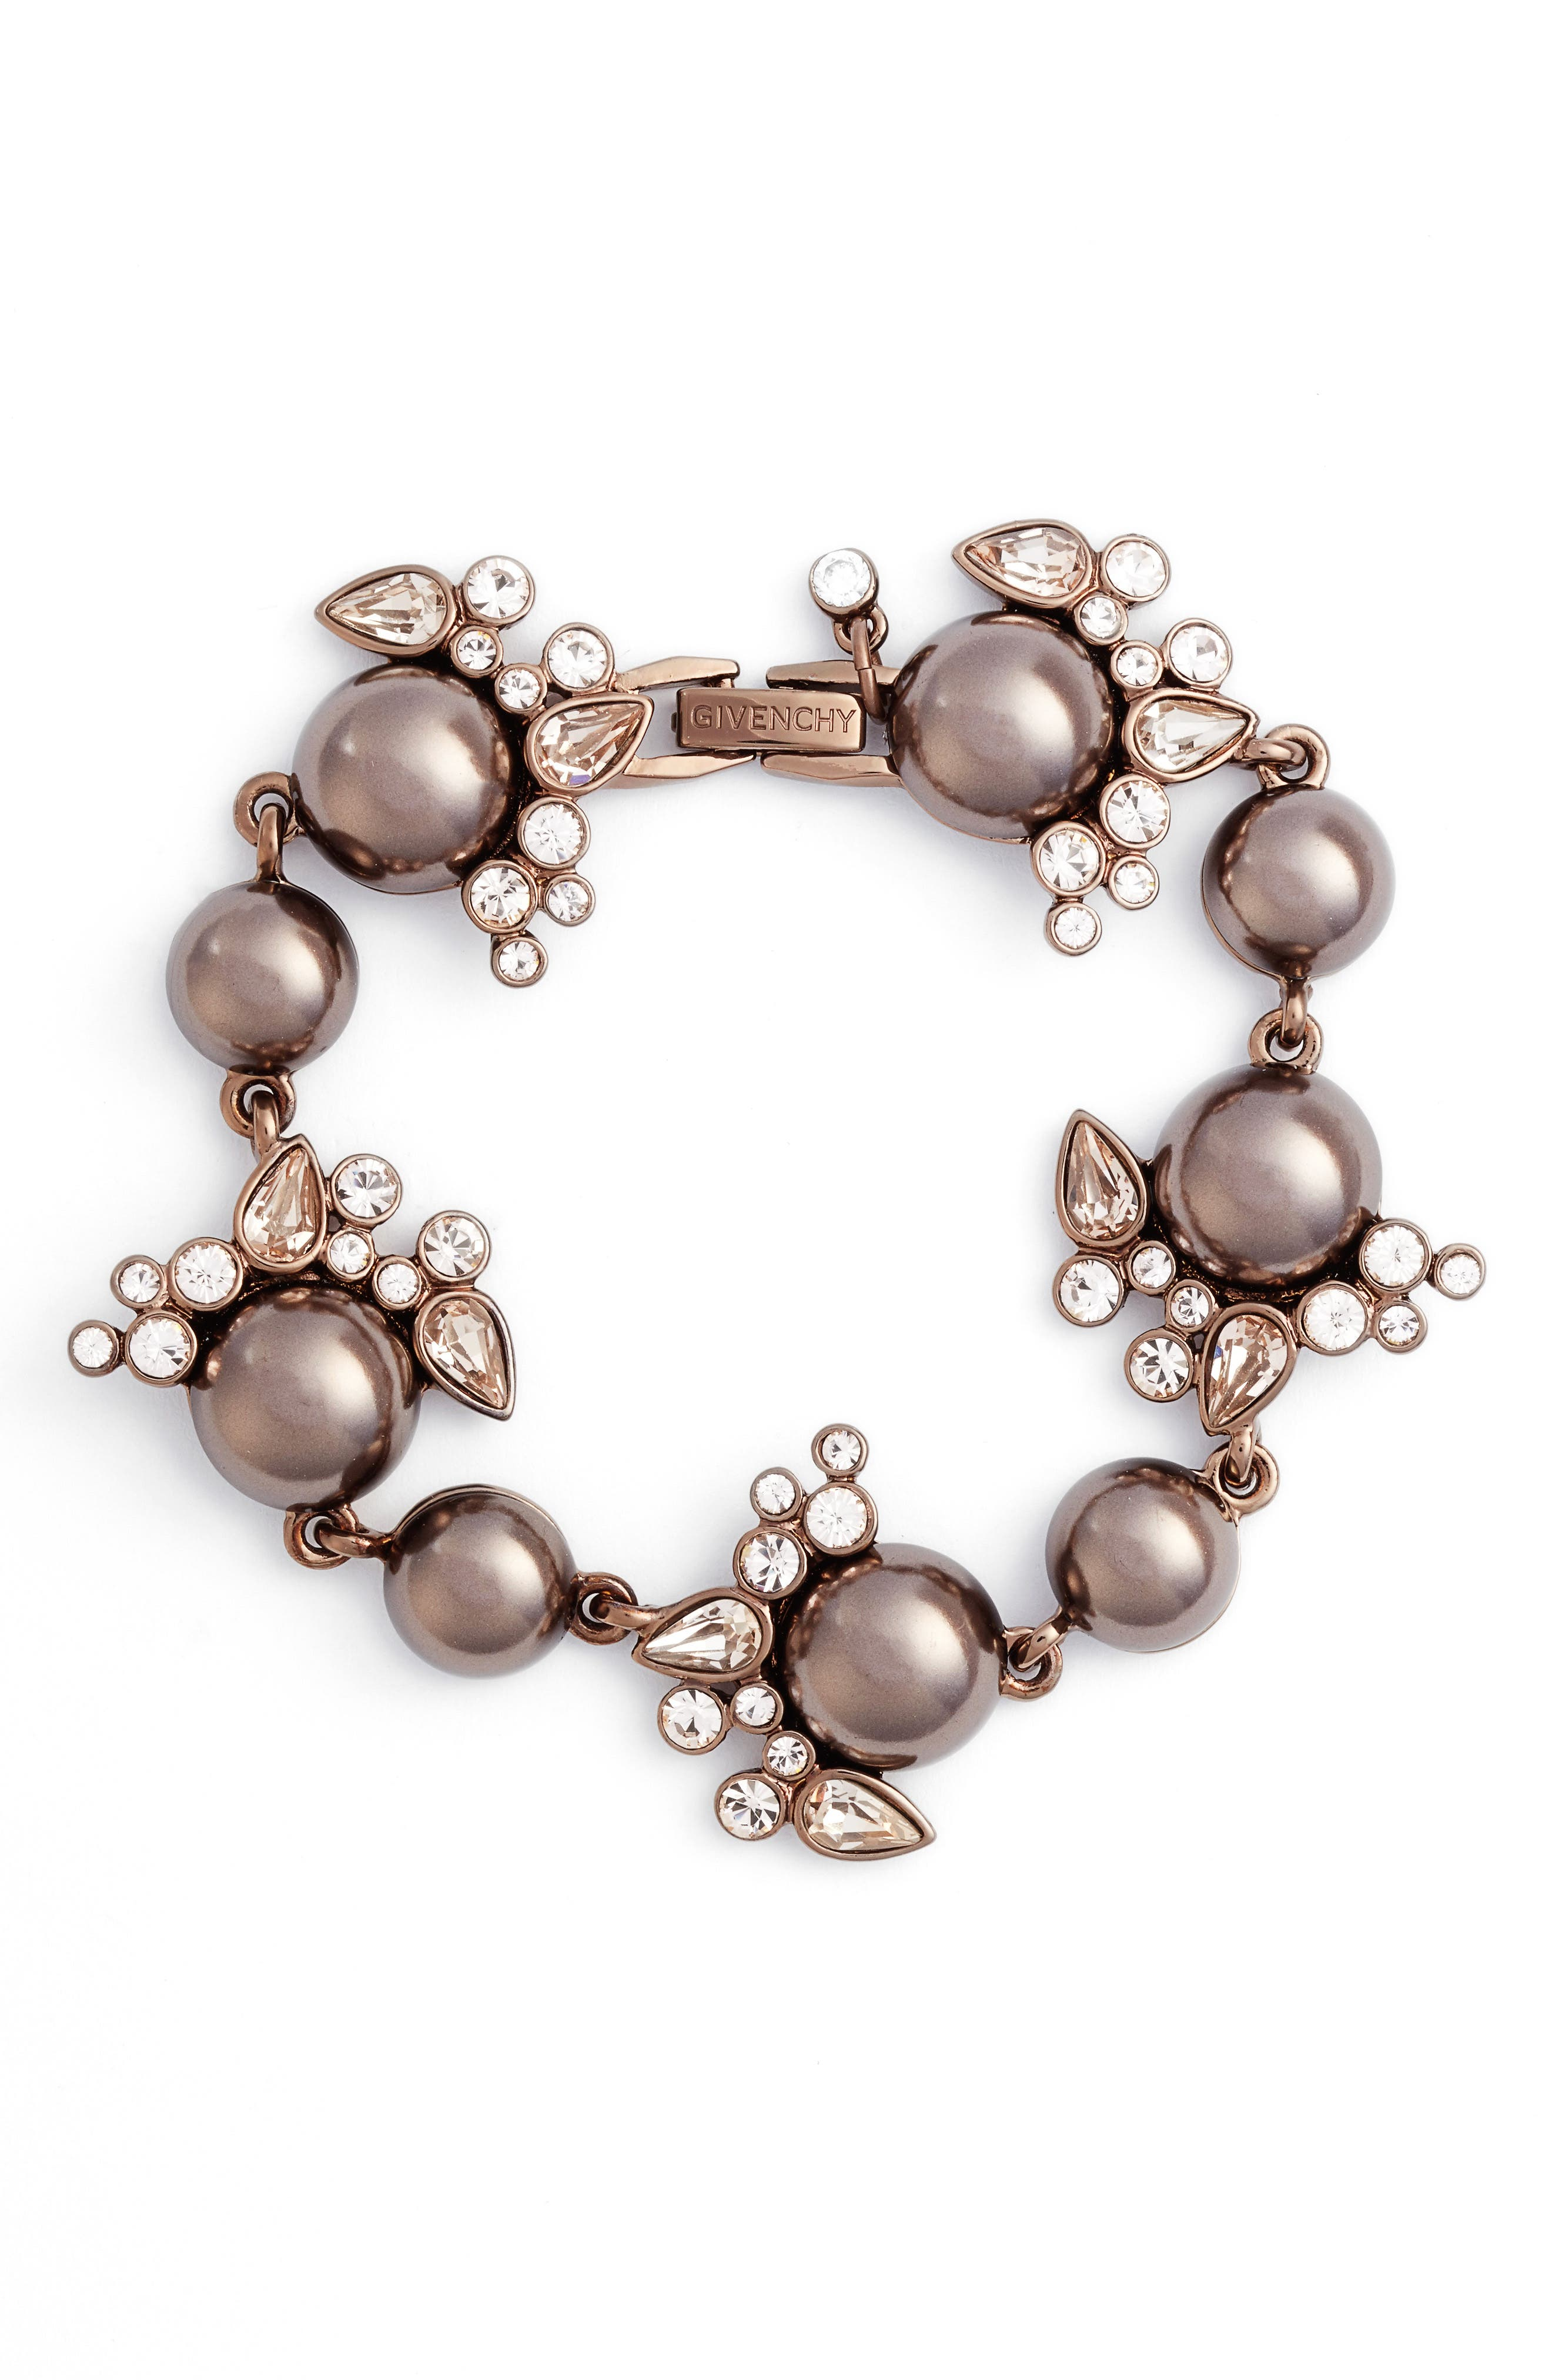 Main Image - Givenchy Imitation Pearl & Crystal Bracelet